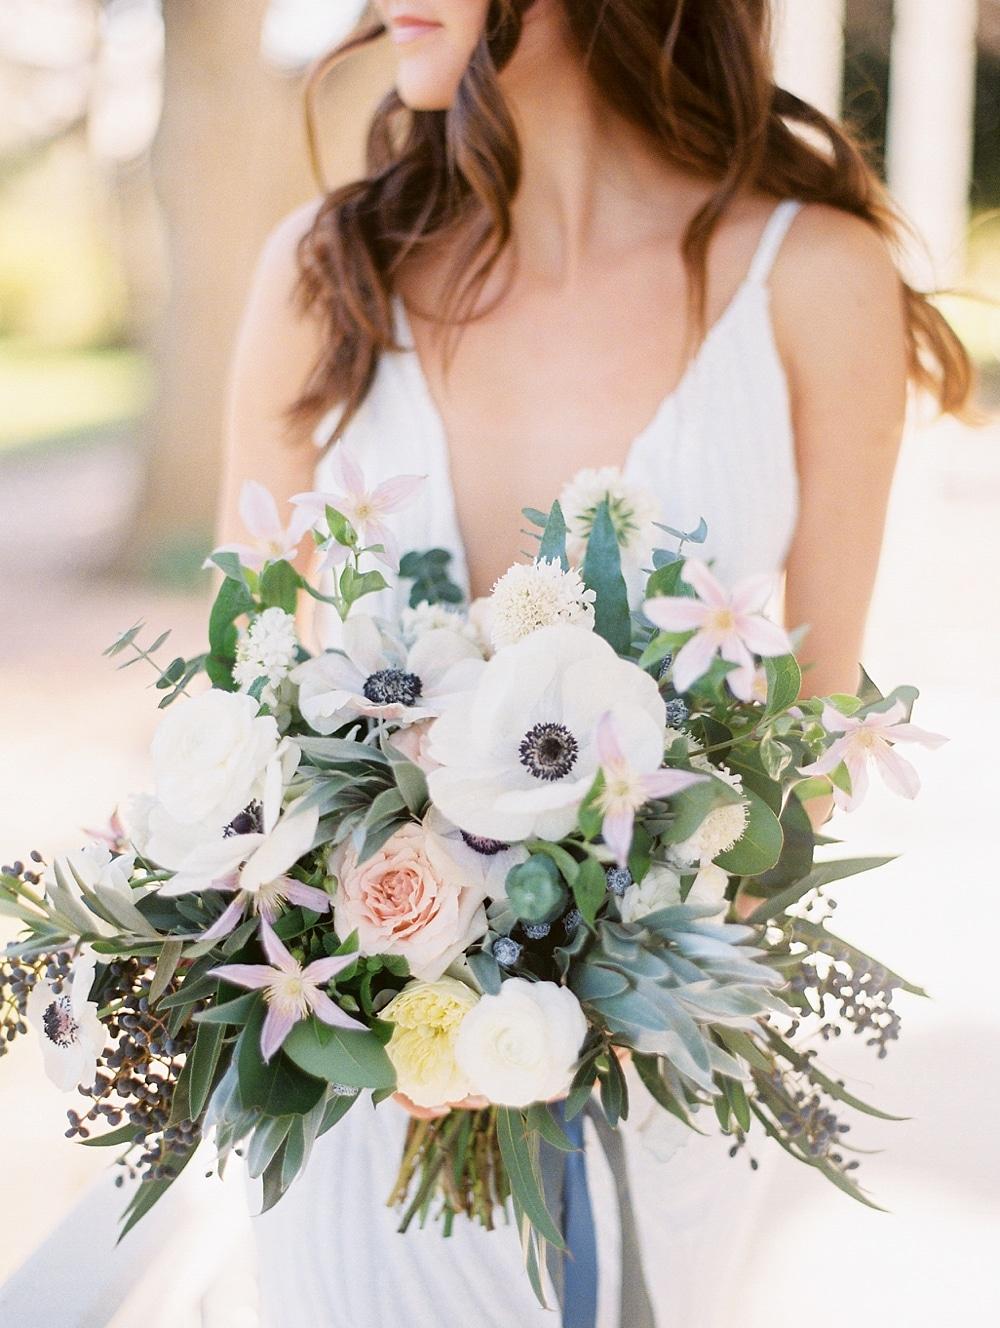 Kristin-La-Voie-Photography-Austin-Wedding-Photographer-barr-mansion (65 of 86)